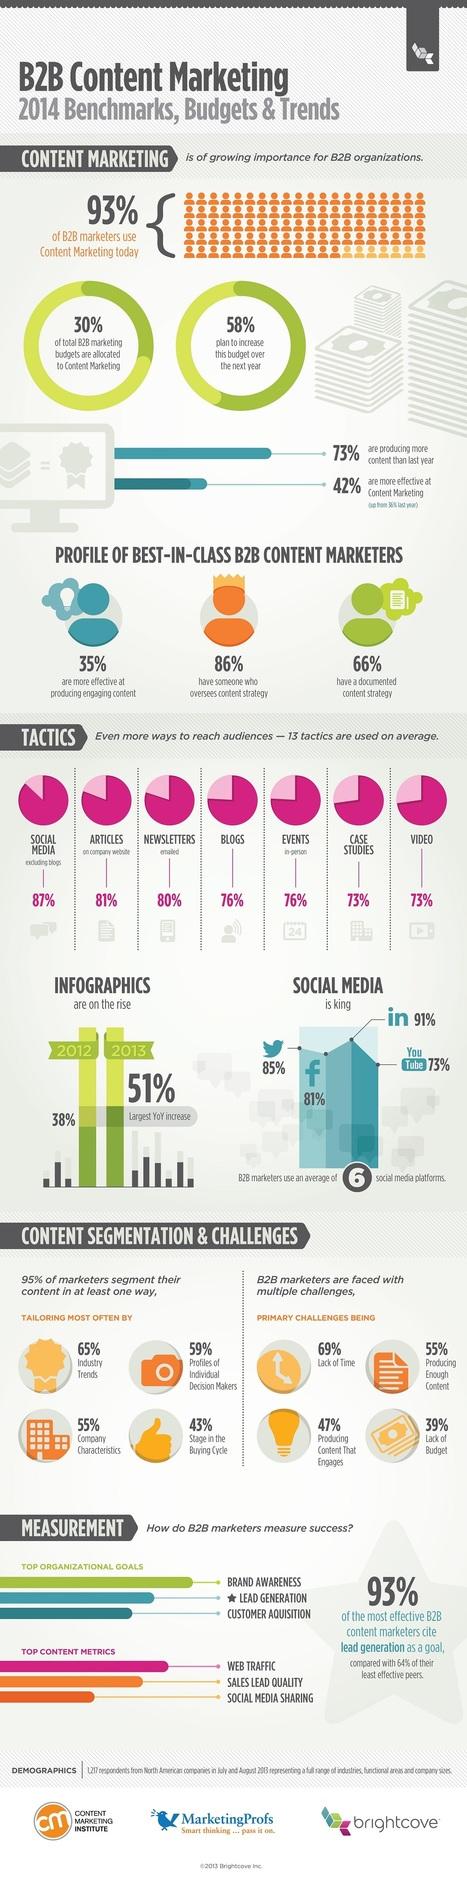 B2B Content Marketing 2014  : benchmarks, budgets and trends   Contenus Marketing BtoB   Scoop.it